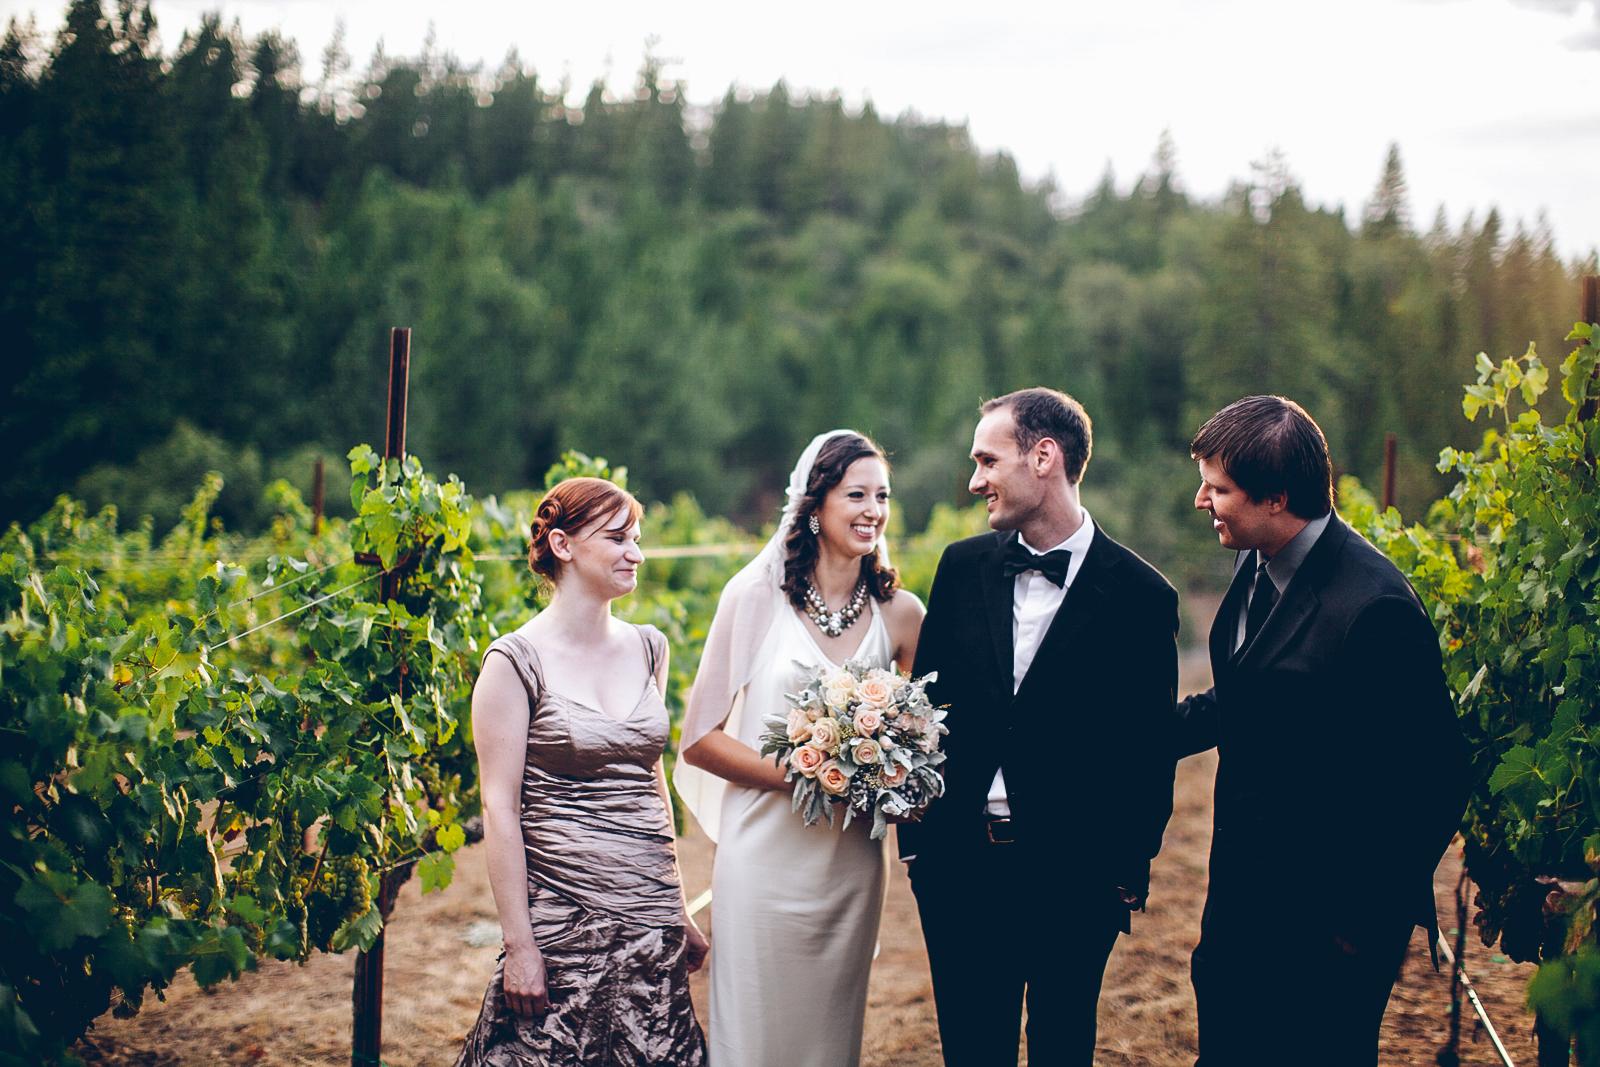 miraflores_winery_wedding_photography_ian_melissa_ebony_siovhan_bokeh_photography_61.jpg